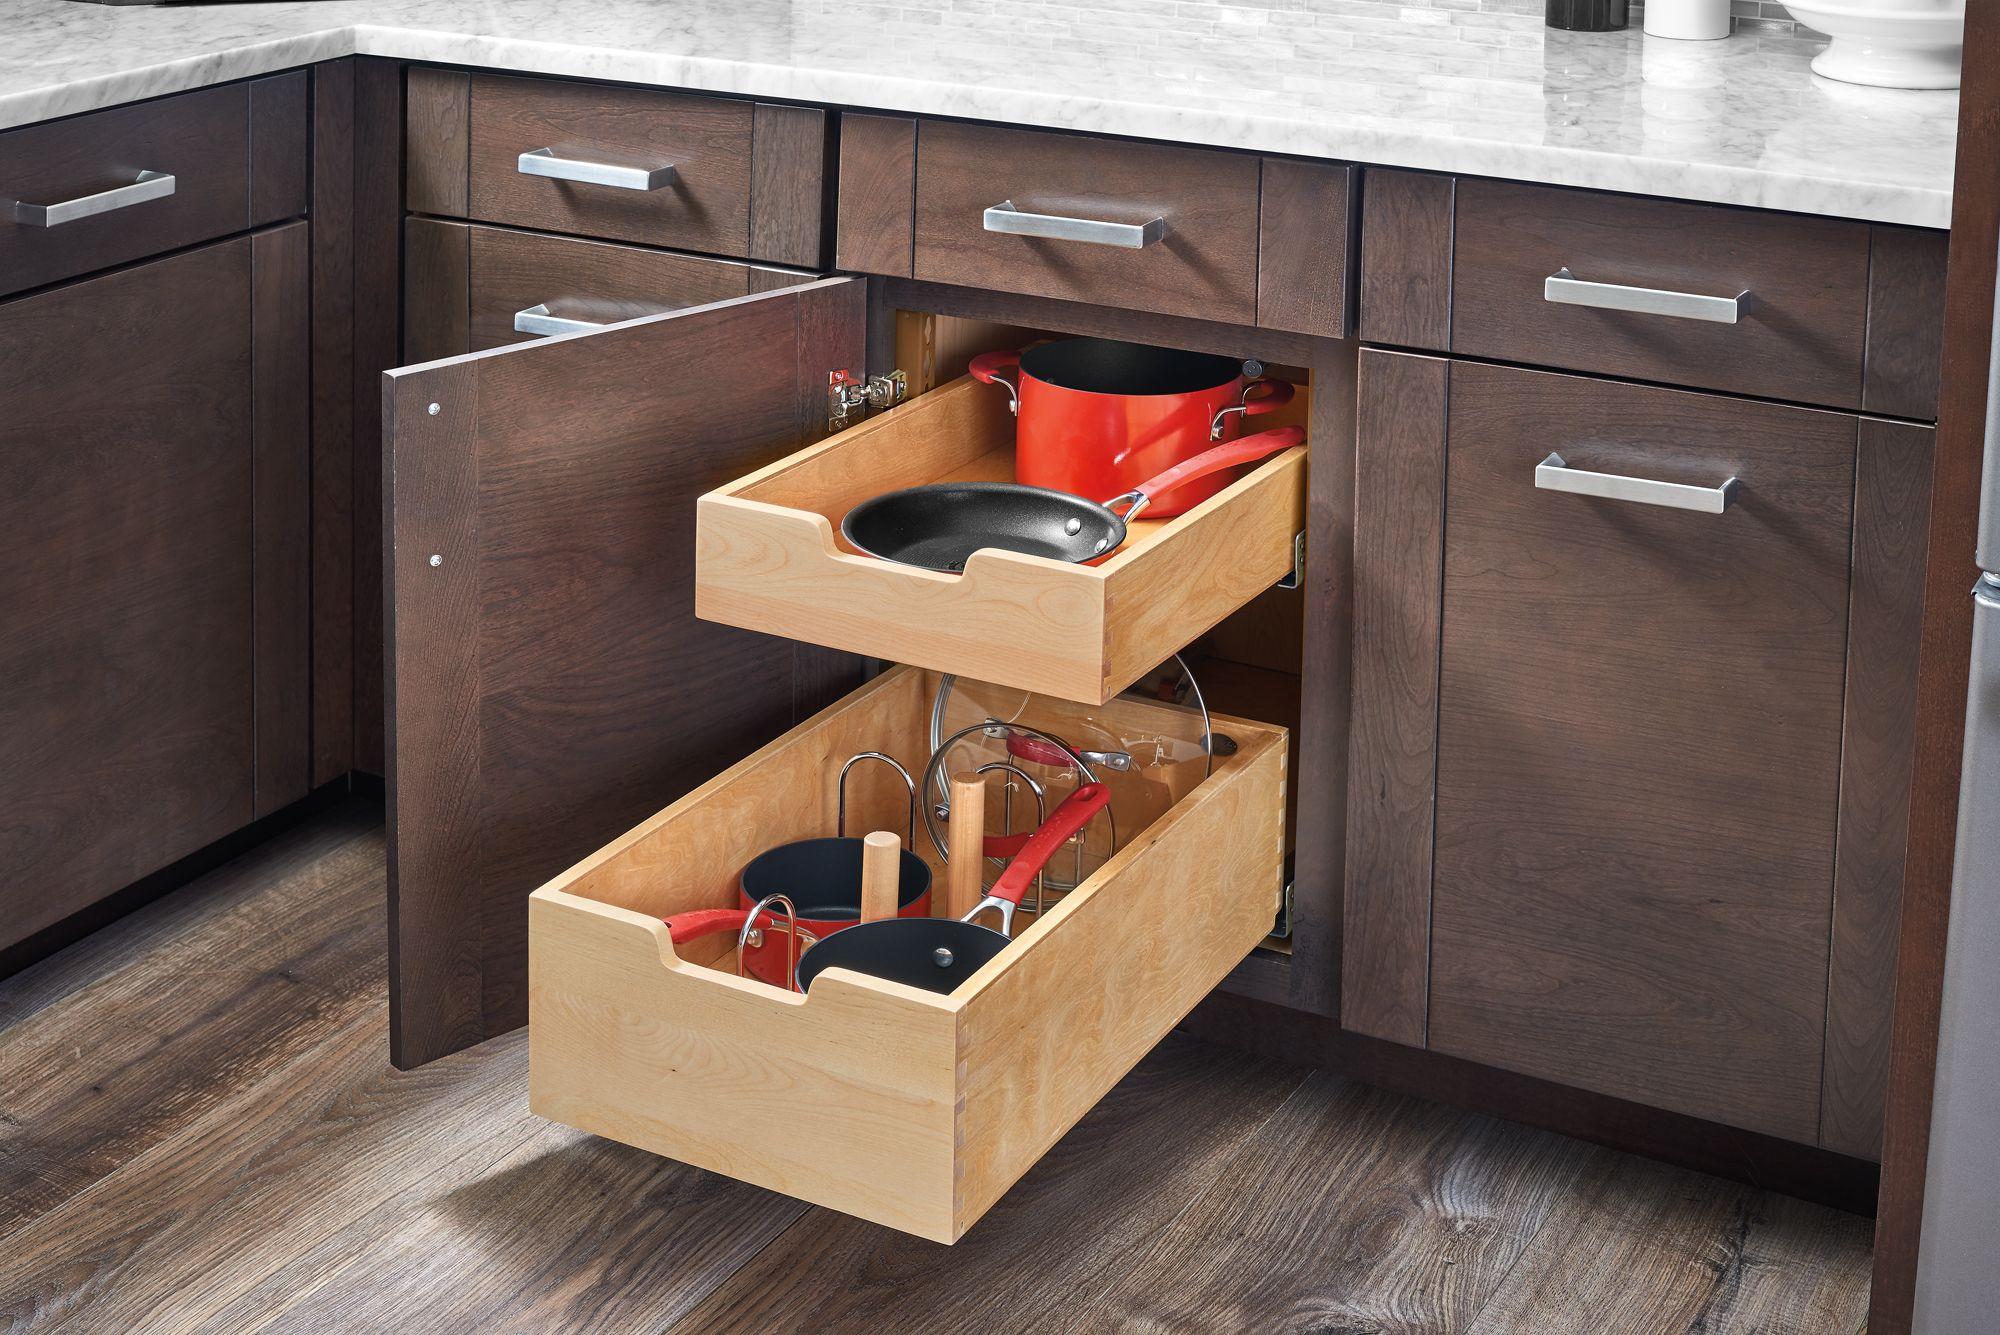 Rev A Shelf 21 Inch Pilaster System Kit Natural 4pil 24sc 2 Cabinets Organization Rev A Shelf Adjustable Shelving